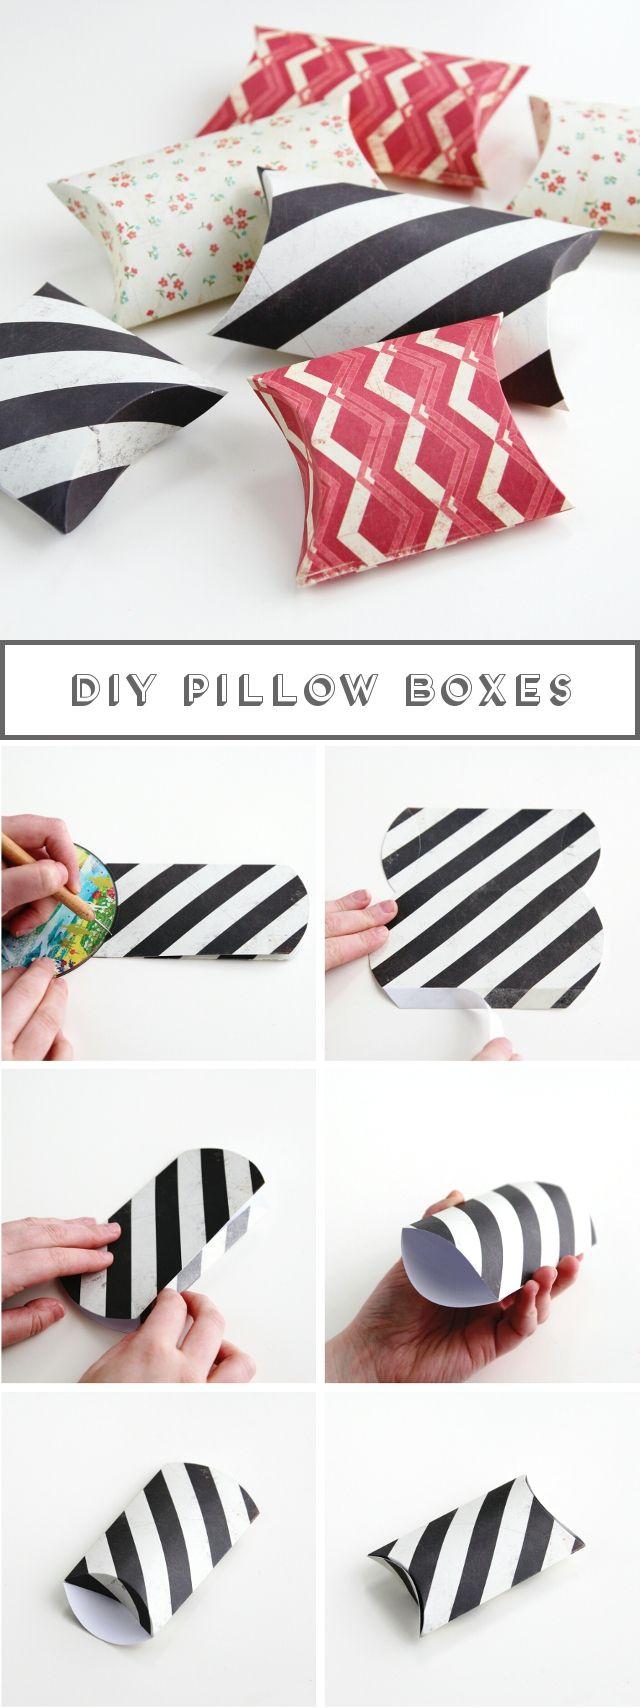 Diy Pillow Boxes                                                                                                                                                      More